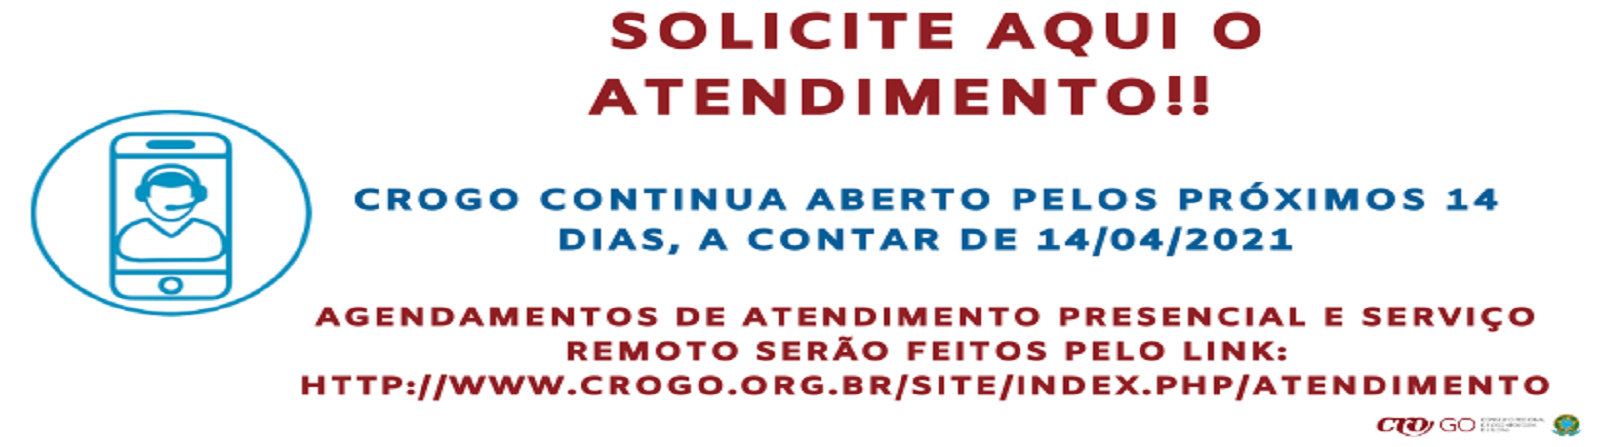 CROGO_continua_aberto_mas_atendimento_presencial_e_servio_remoto_via_link_-_1600_x_447